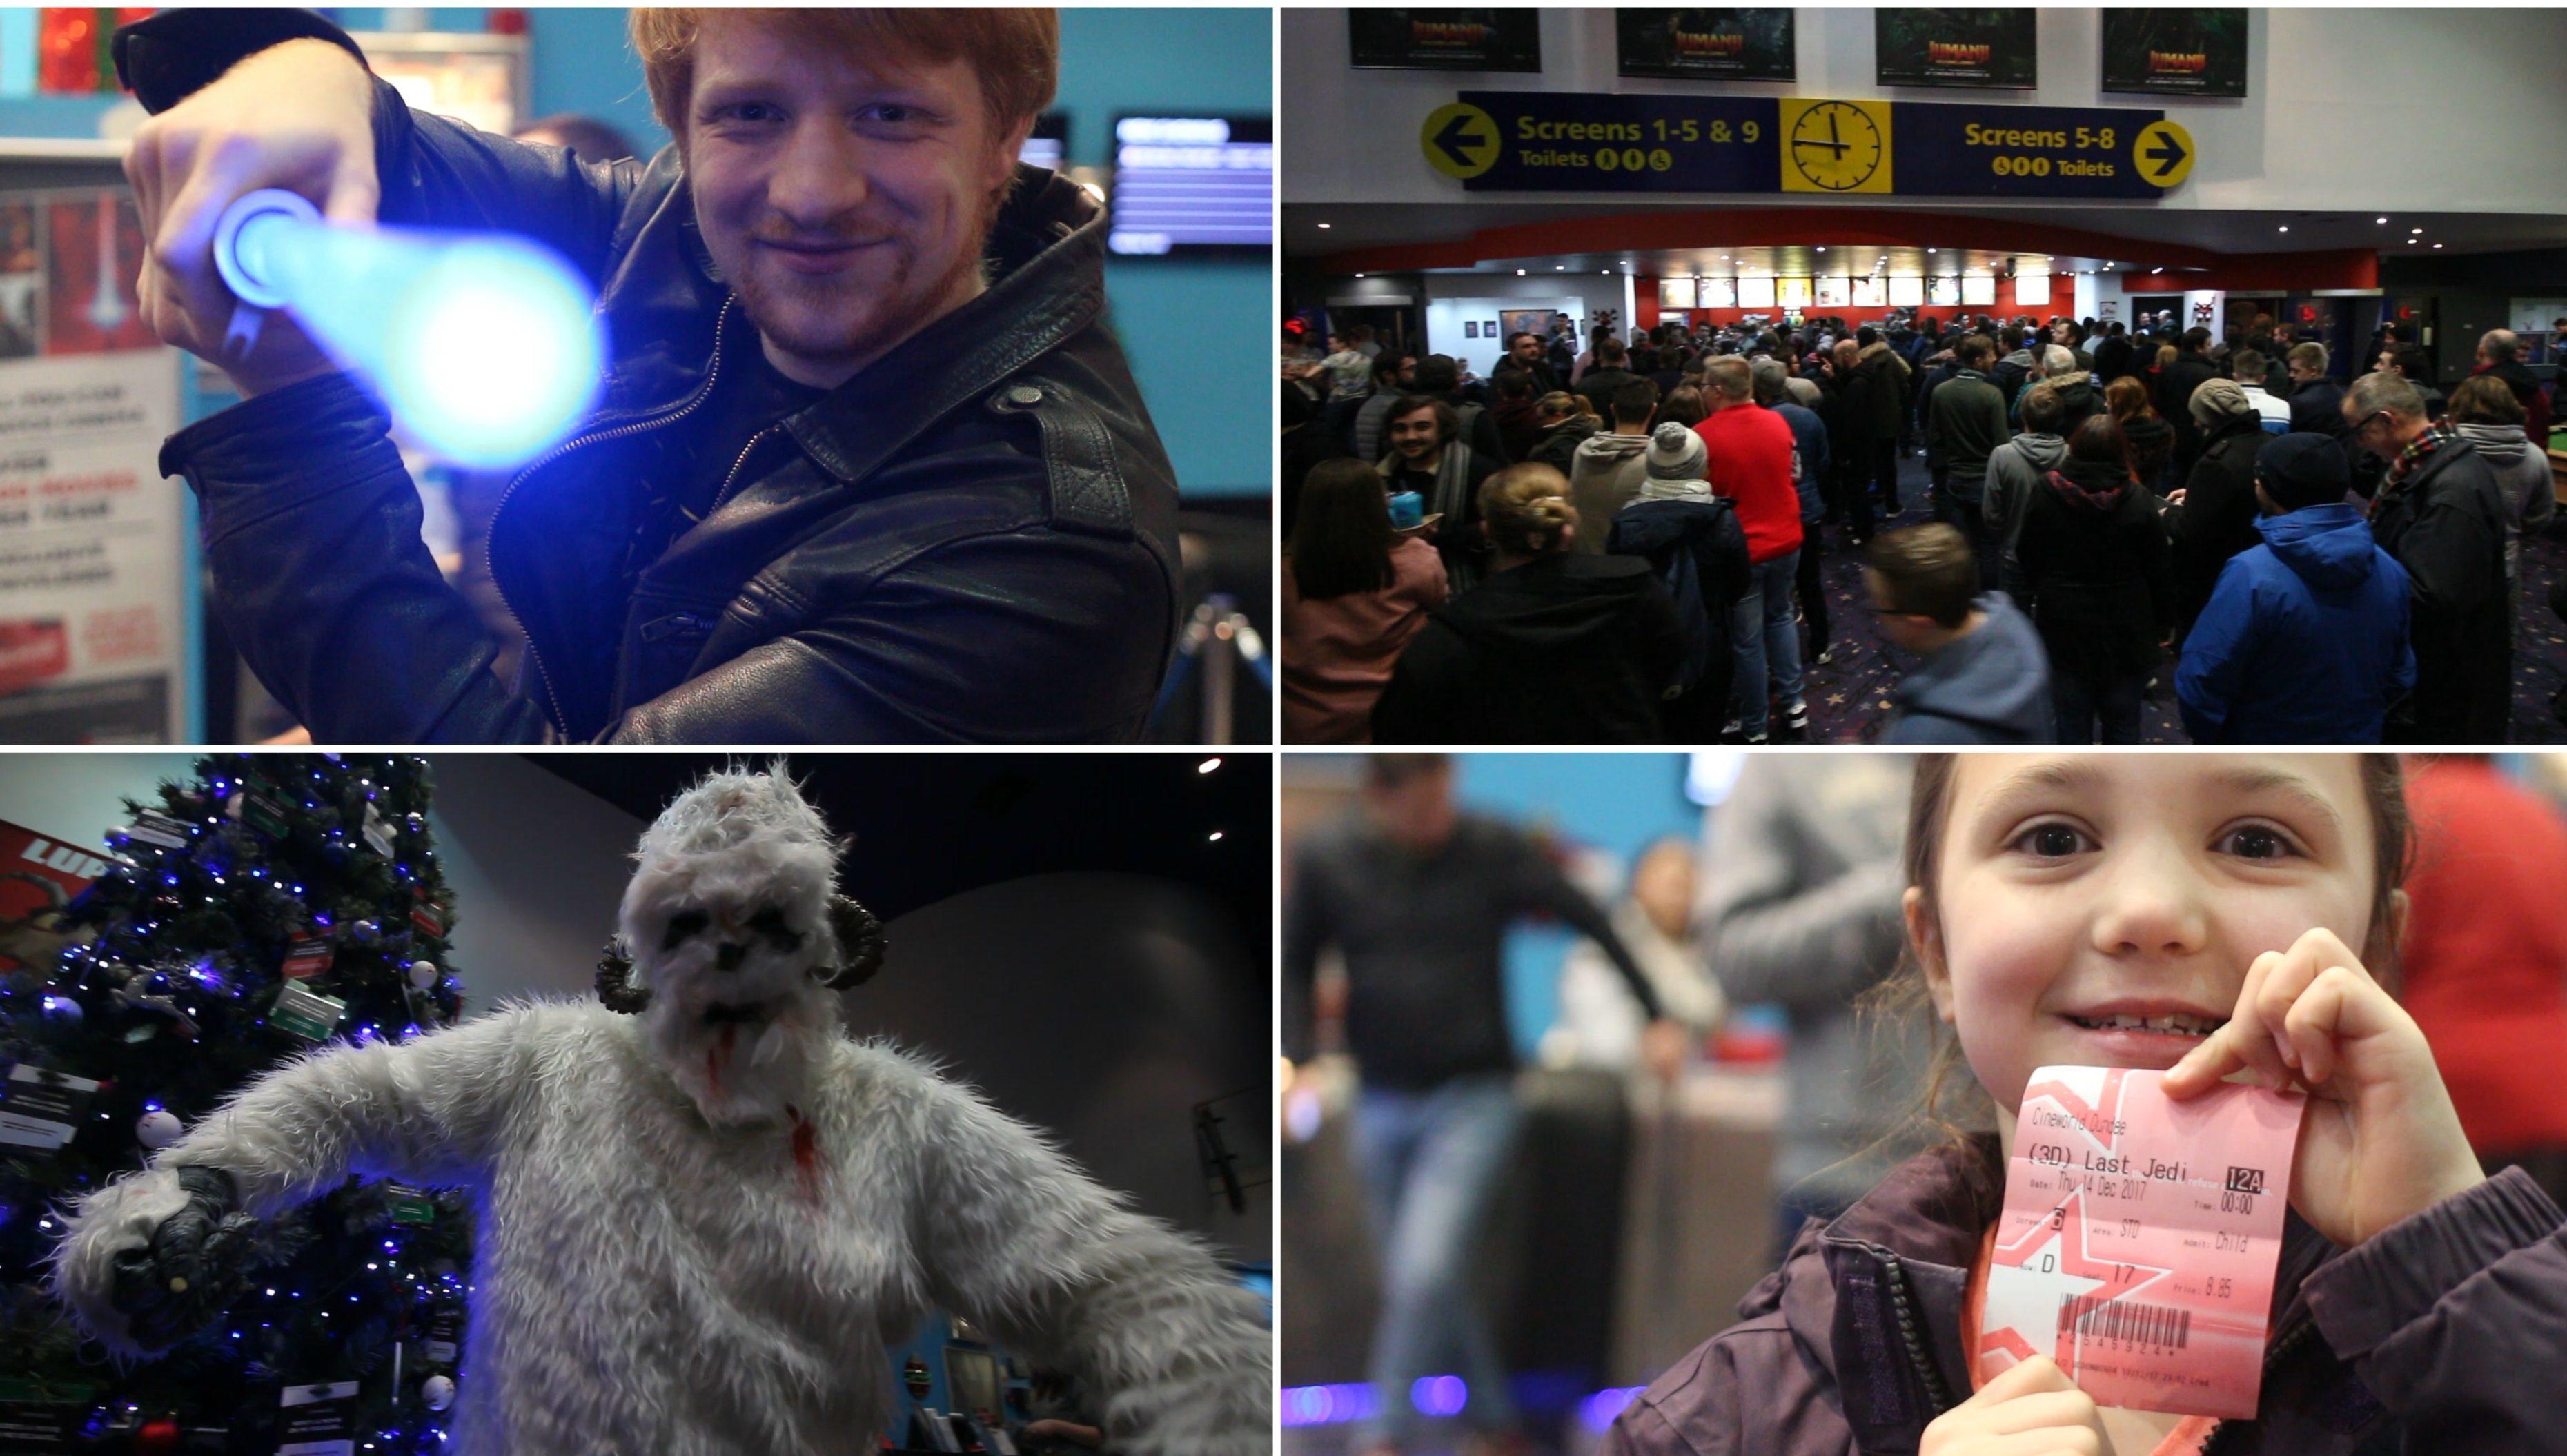 Star Wars fans arrive in Cineworld, Dundee.